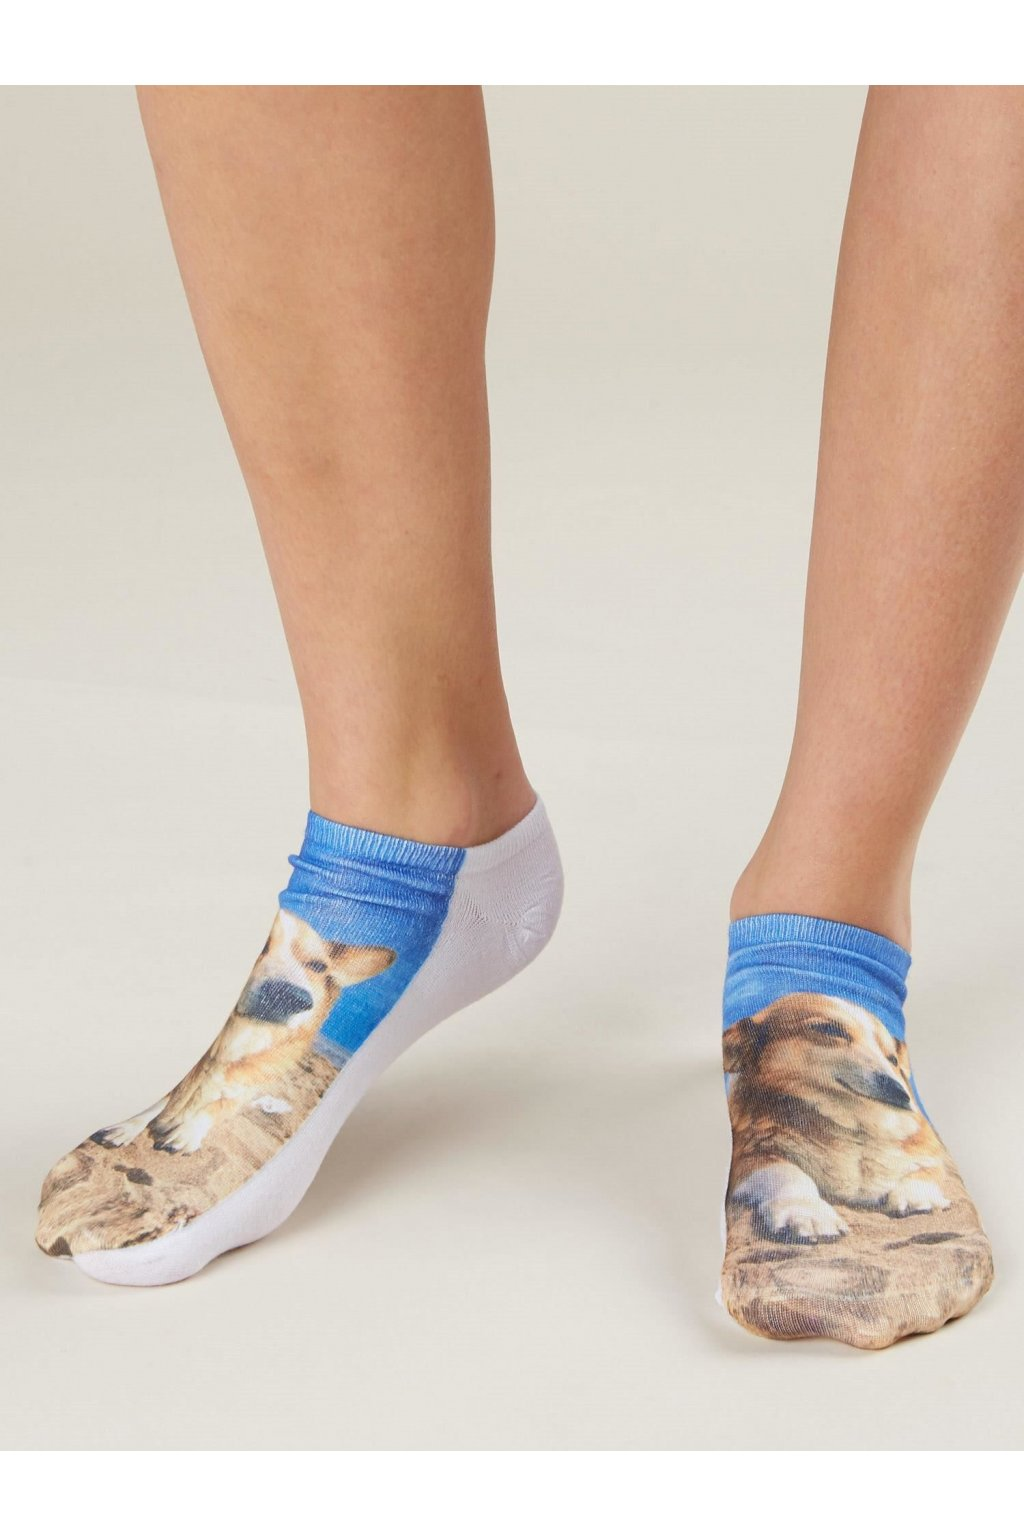 Dámske ponožky kód 7-SR-PWF-01595-6